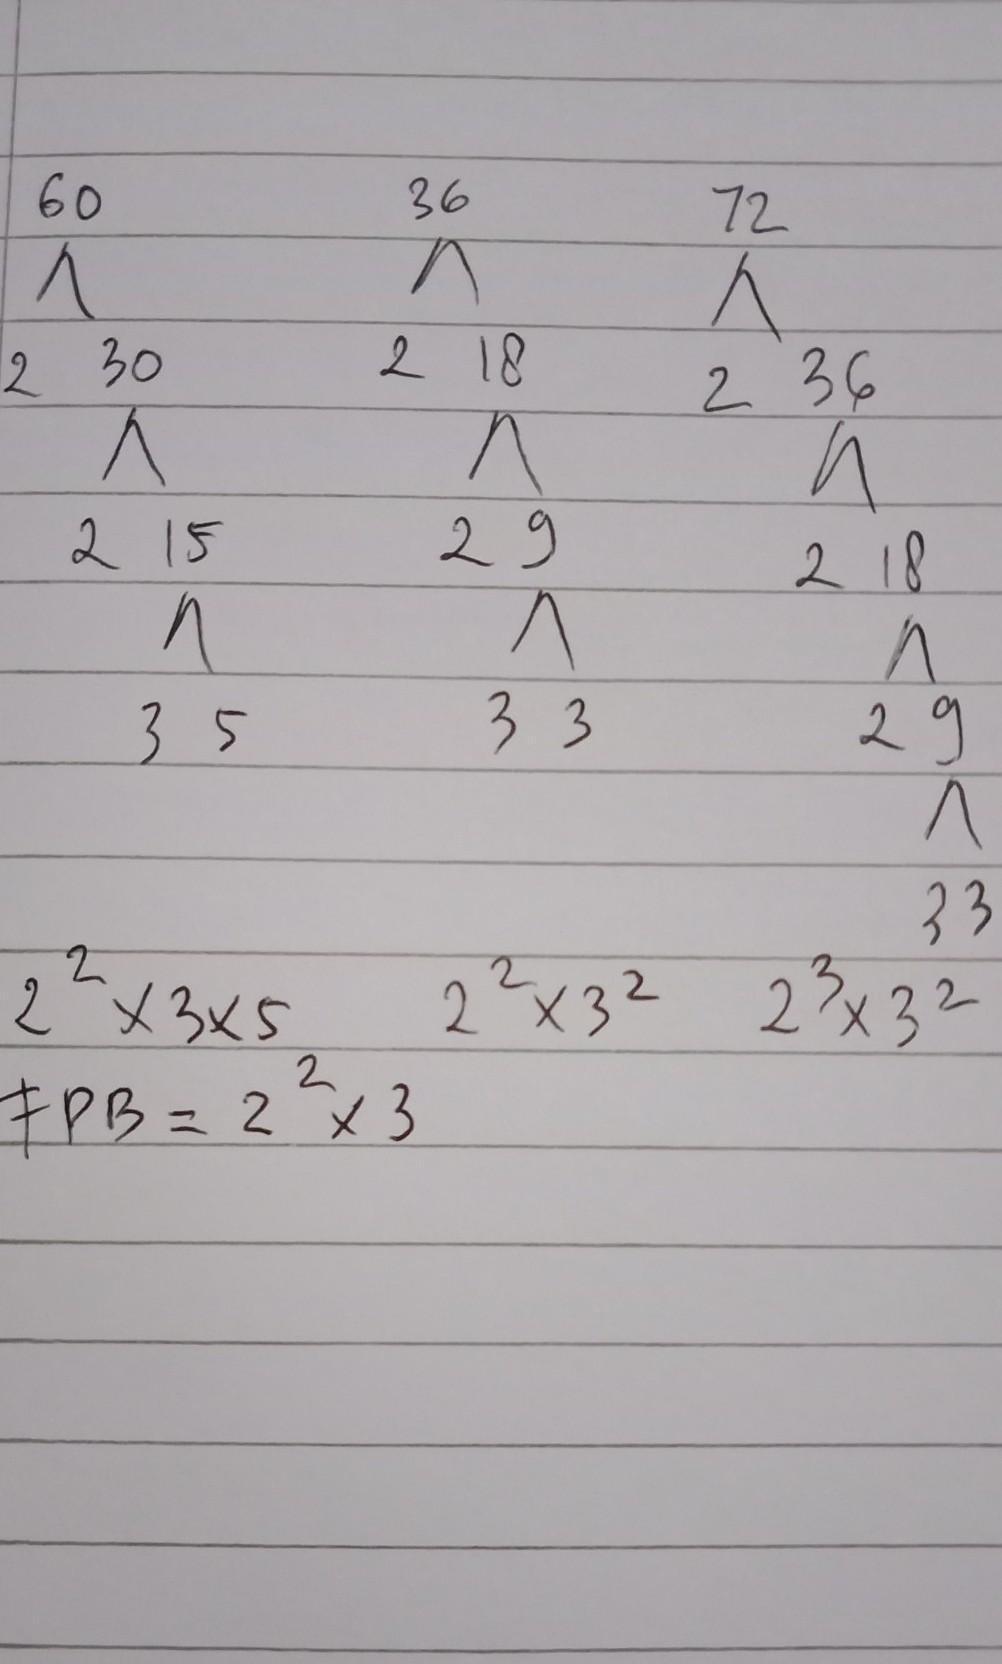 Fpb Dari 60 Dan 72 : Faktor, Persekutuan, Terbesar, Darii, 60,36,dan, Dalam, Bentuk, Faktorisasi, Prima, Adalah, Brainly.co.id